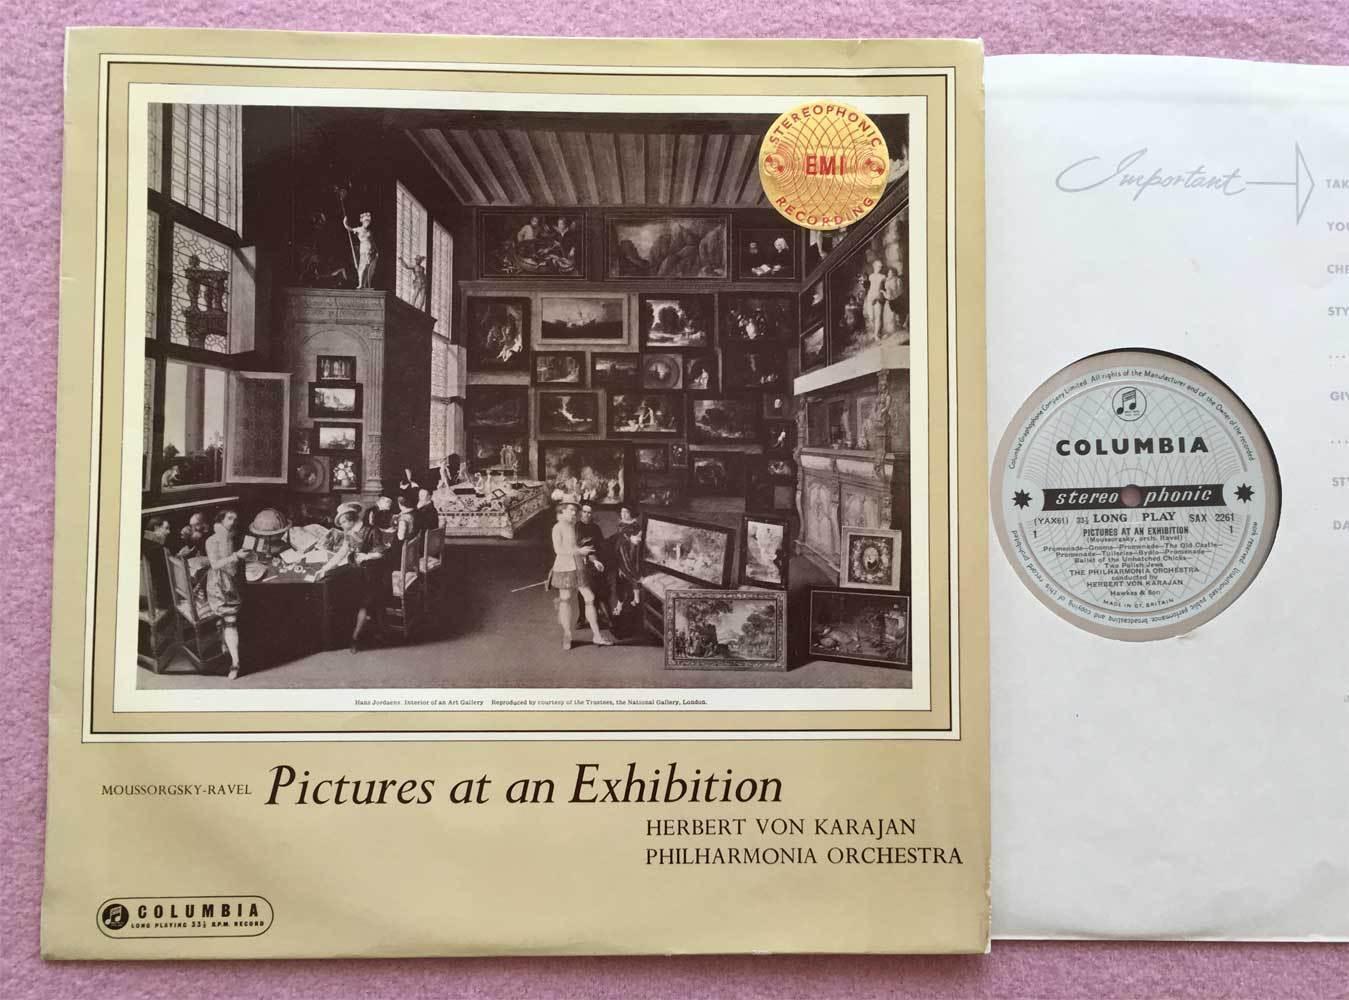 HERBERT von KARAJAN Mussorgsky ORIG Columbia blue/silver SAX 2261 UK-1960 LP NM-